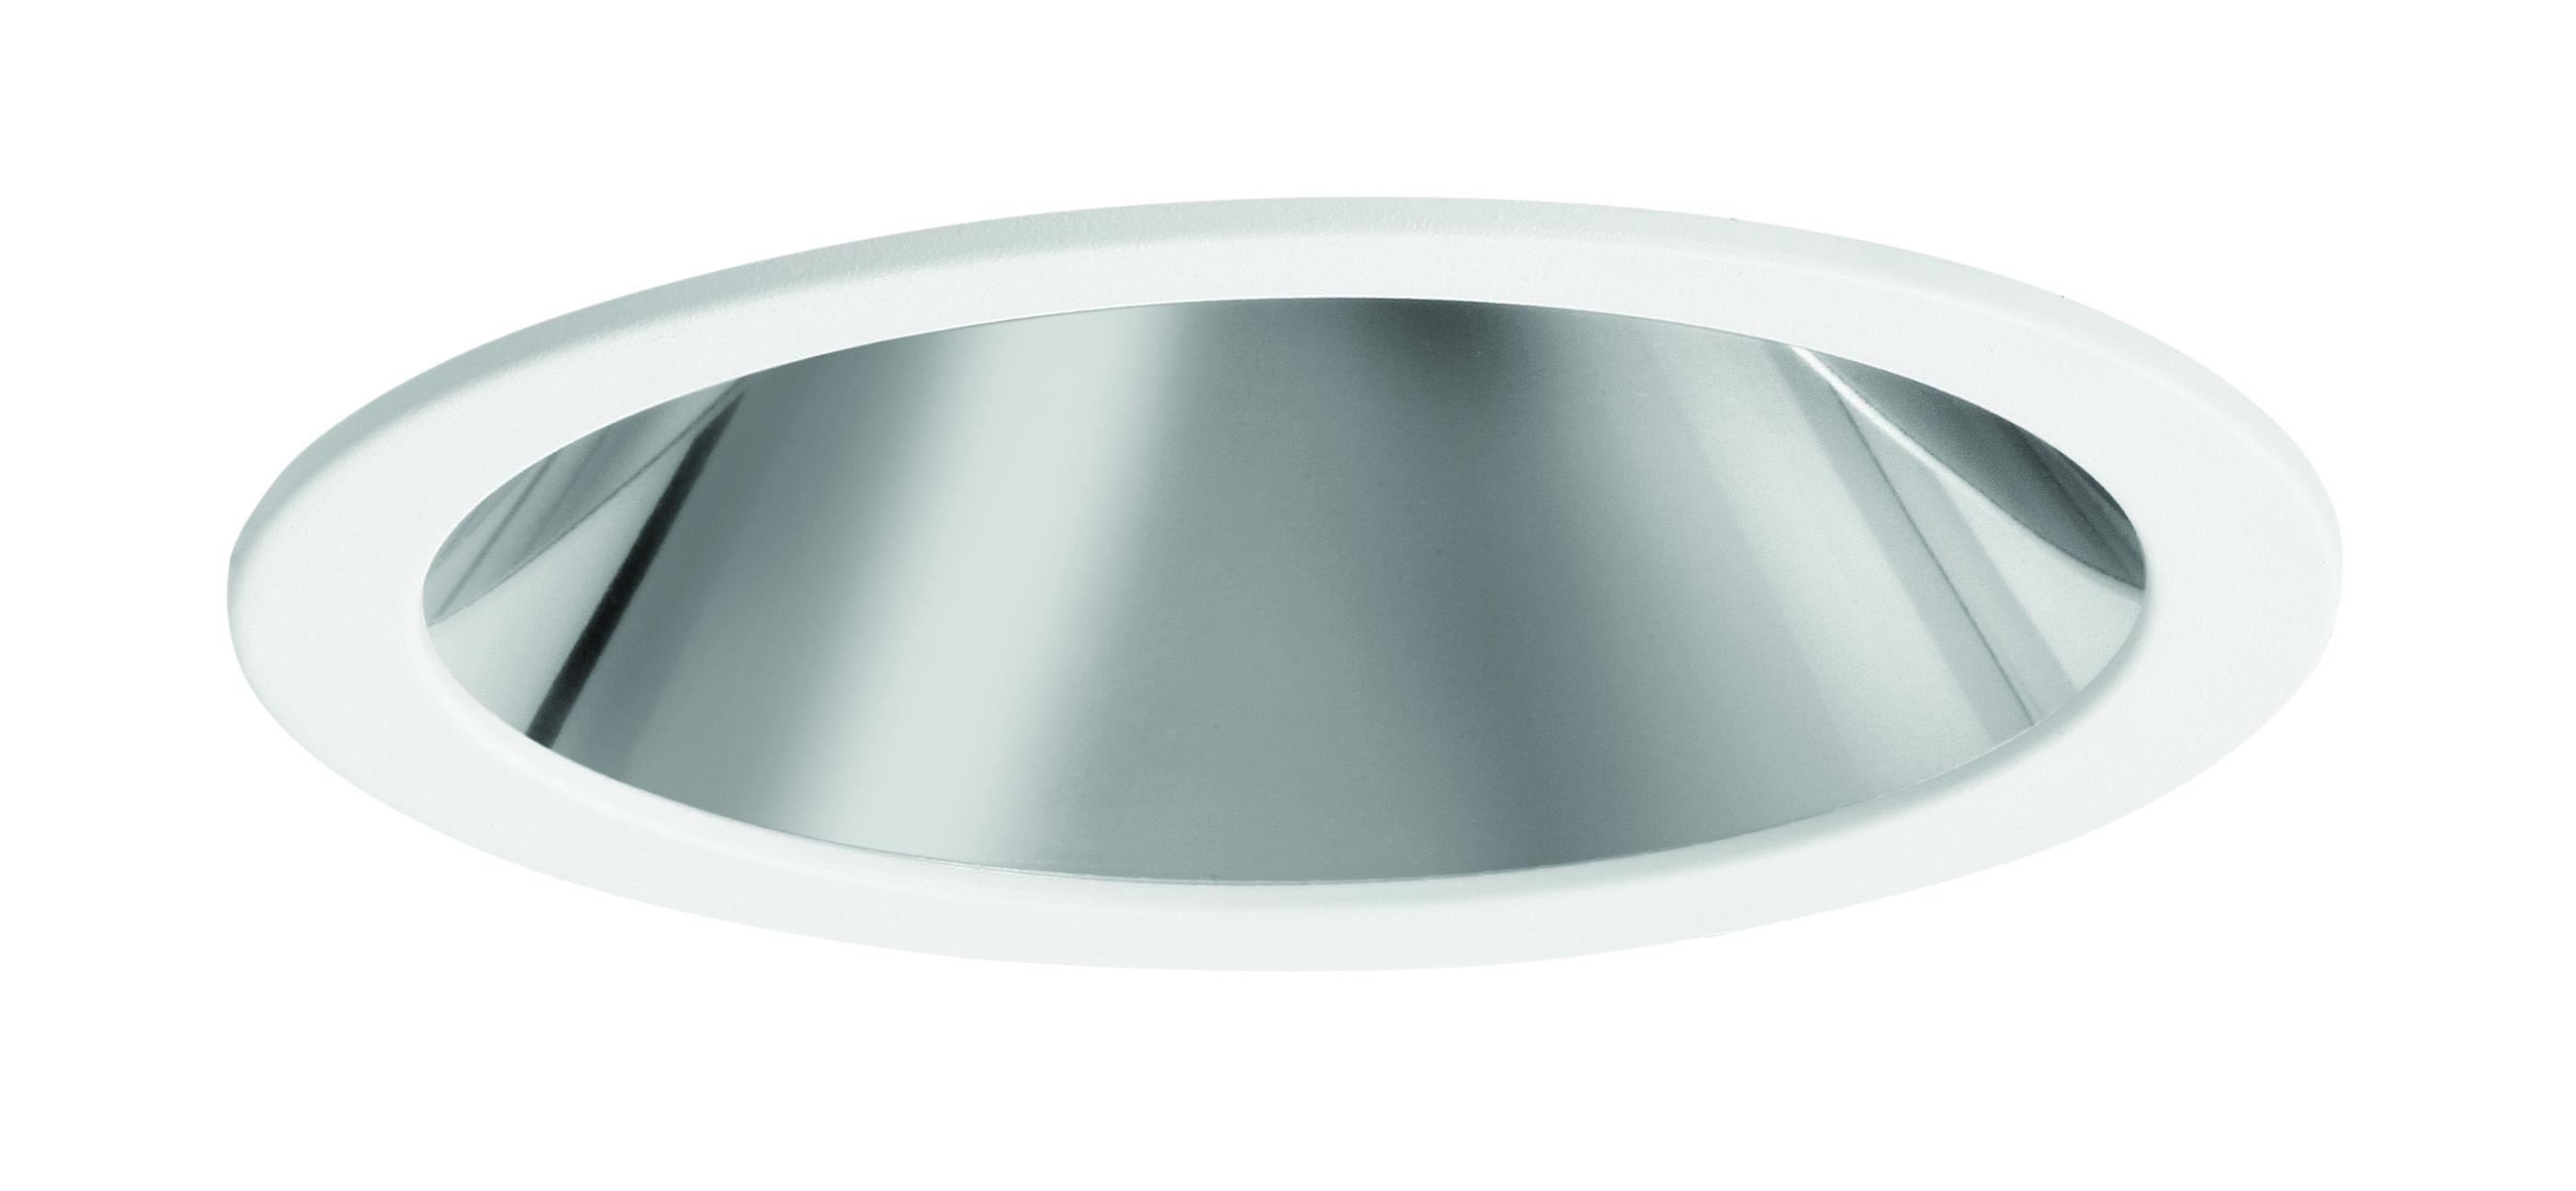 1 Stk Kain LED Downlight 24W 4000K 1800lm, 62°, DIM 1-10V, RAL9003 LI99000527